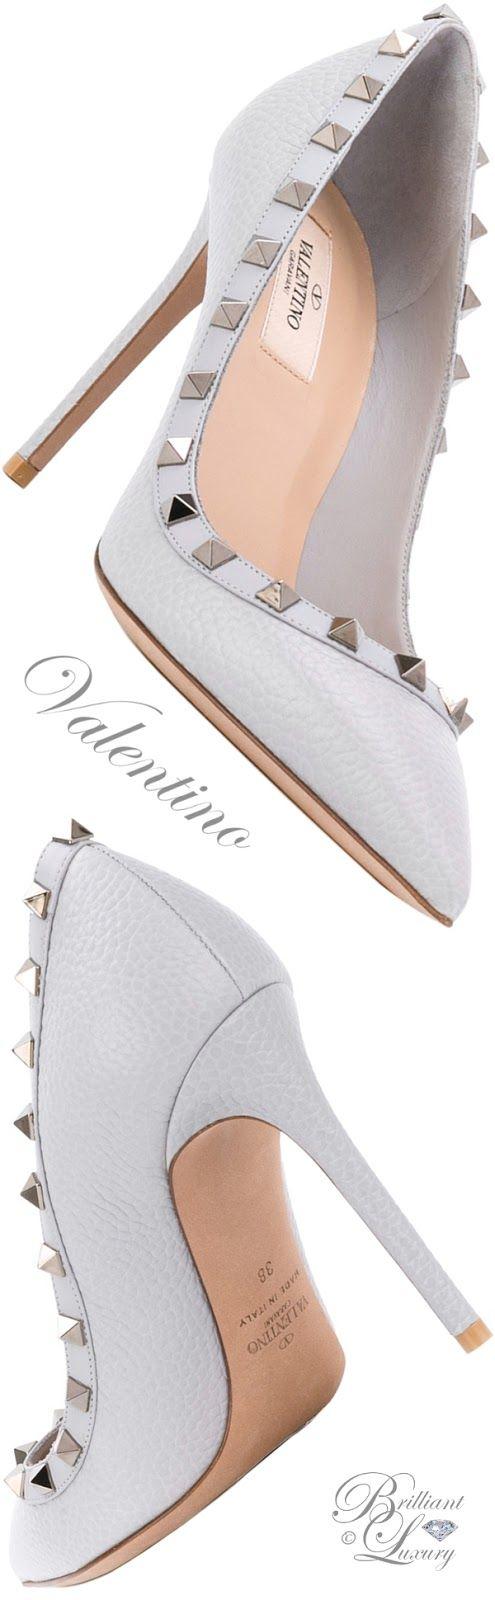 Brilliant Luxury by Emmy DE ♦ Valentino Garavani Rockstud Pumps